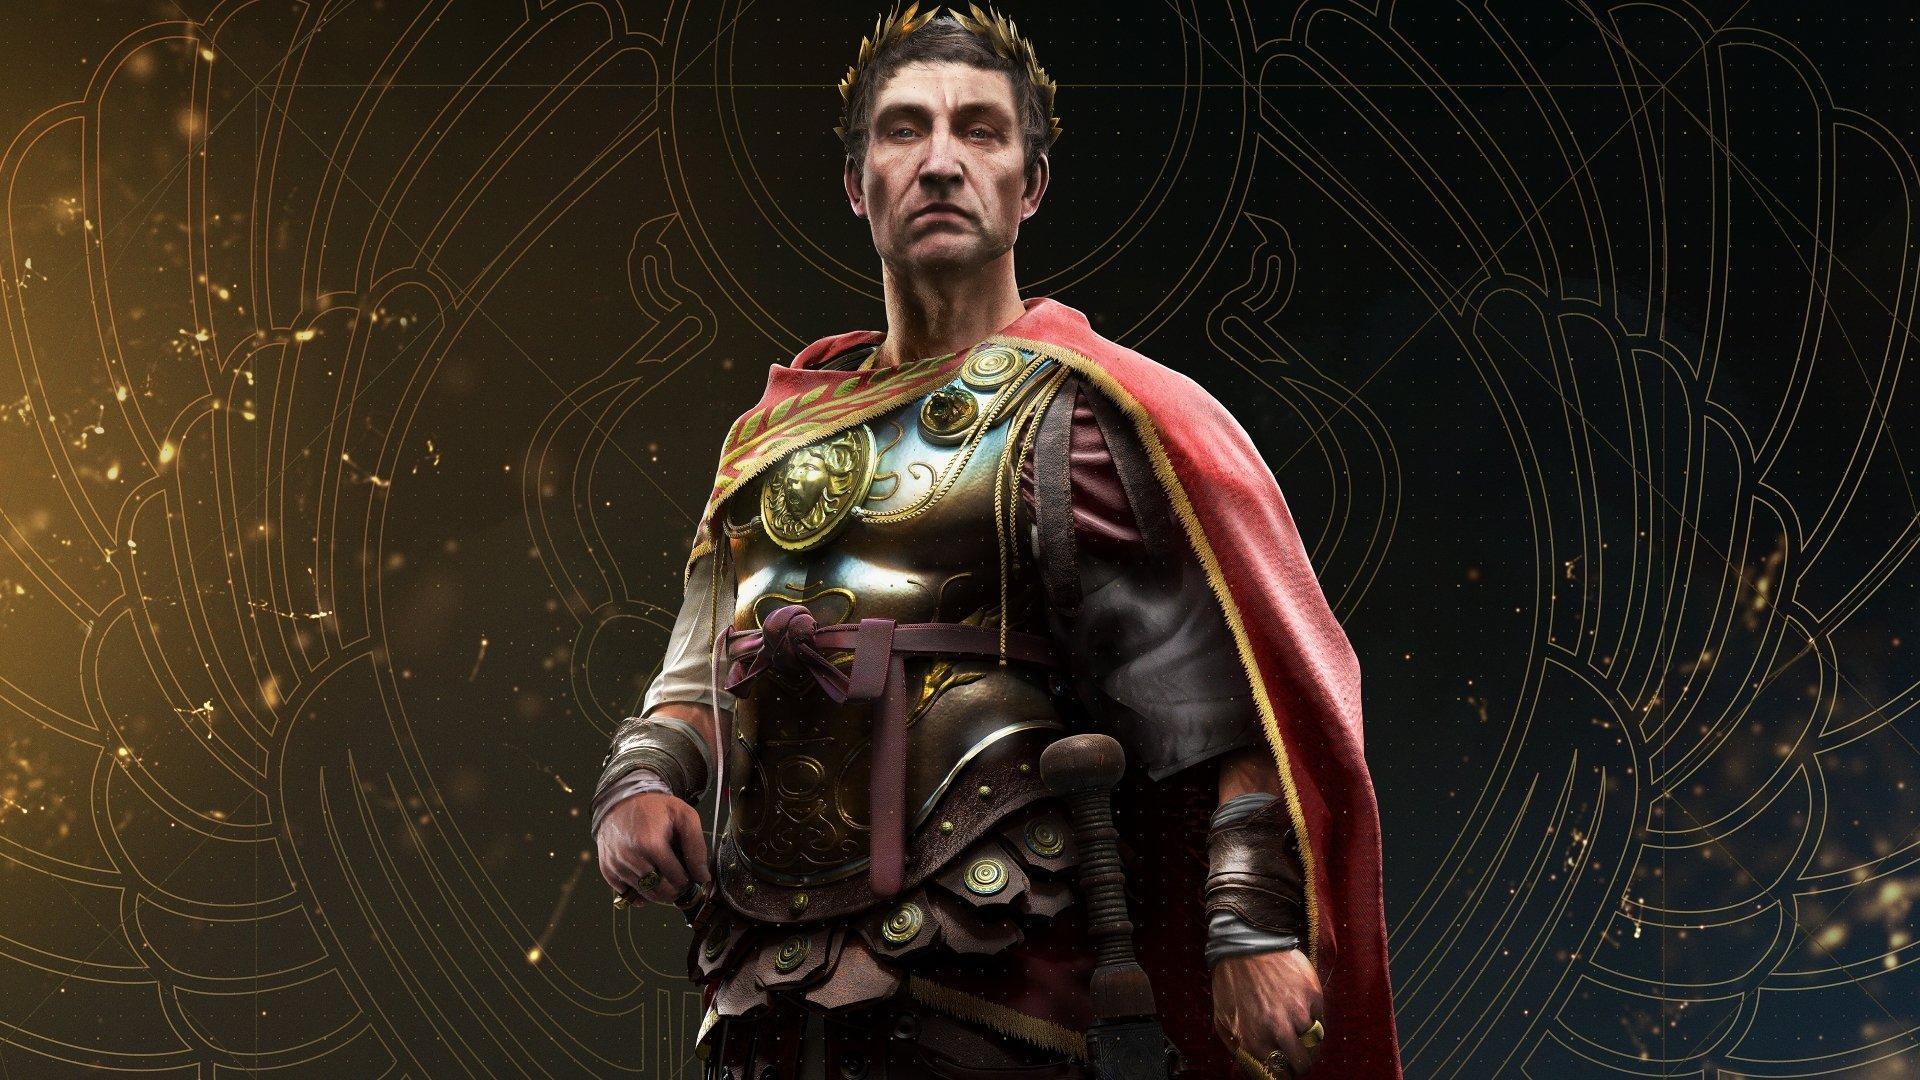 Video Game - Assassin's Creed Origins  Julius Caesar Wallpaper